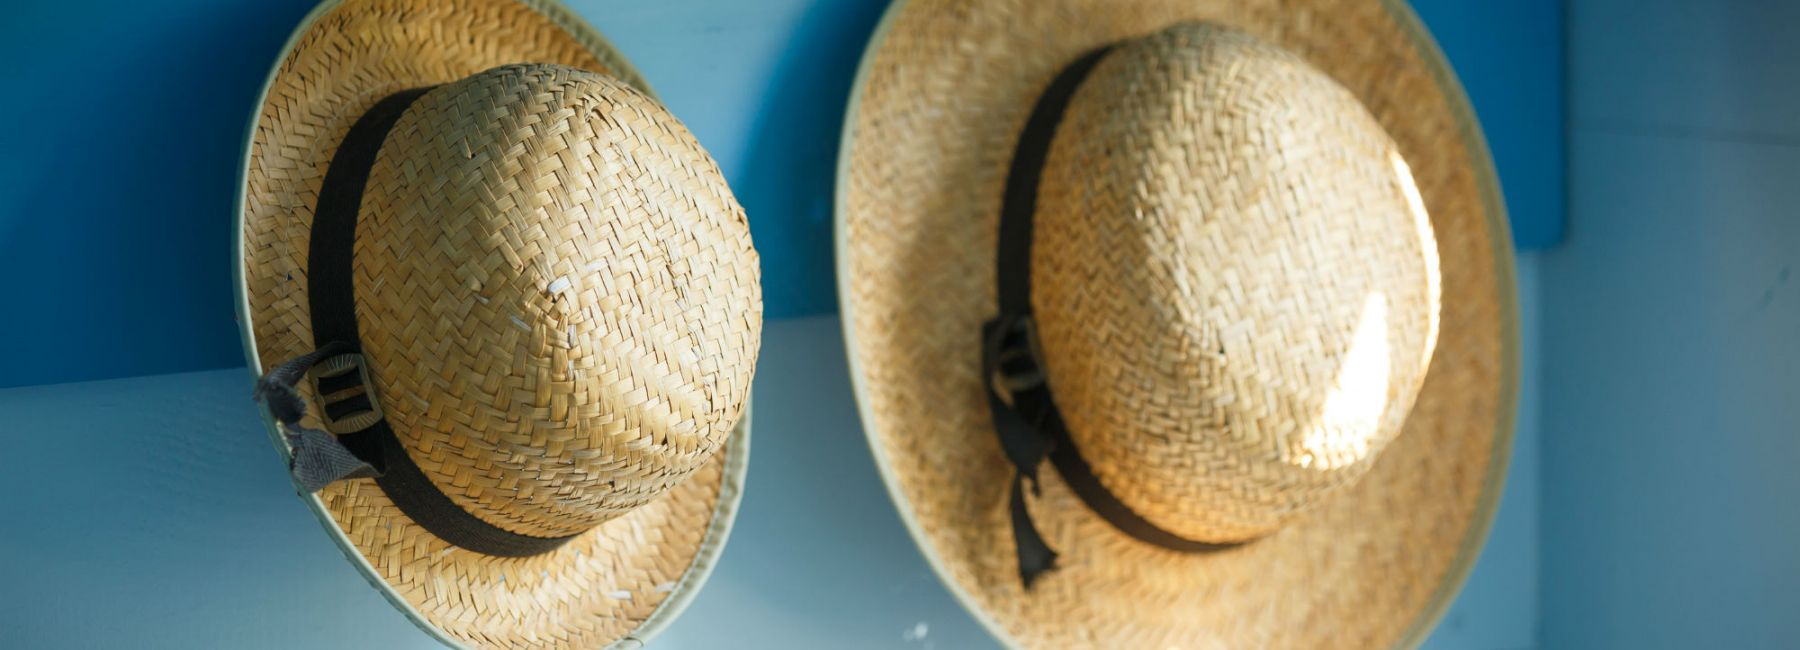 Amish Acres Hats